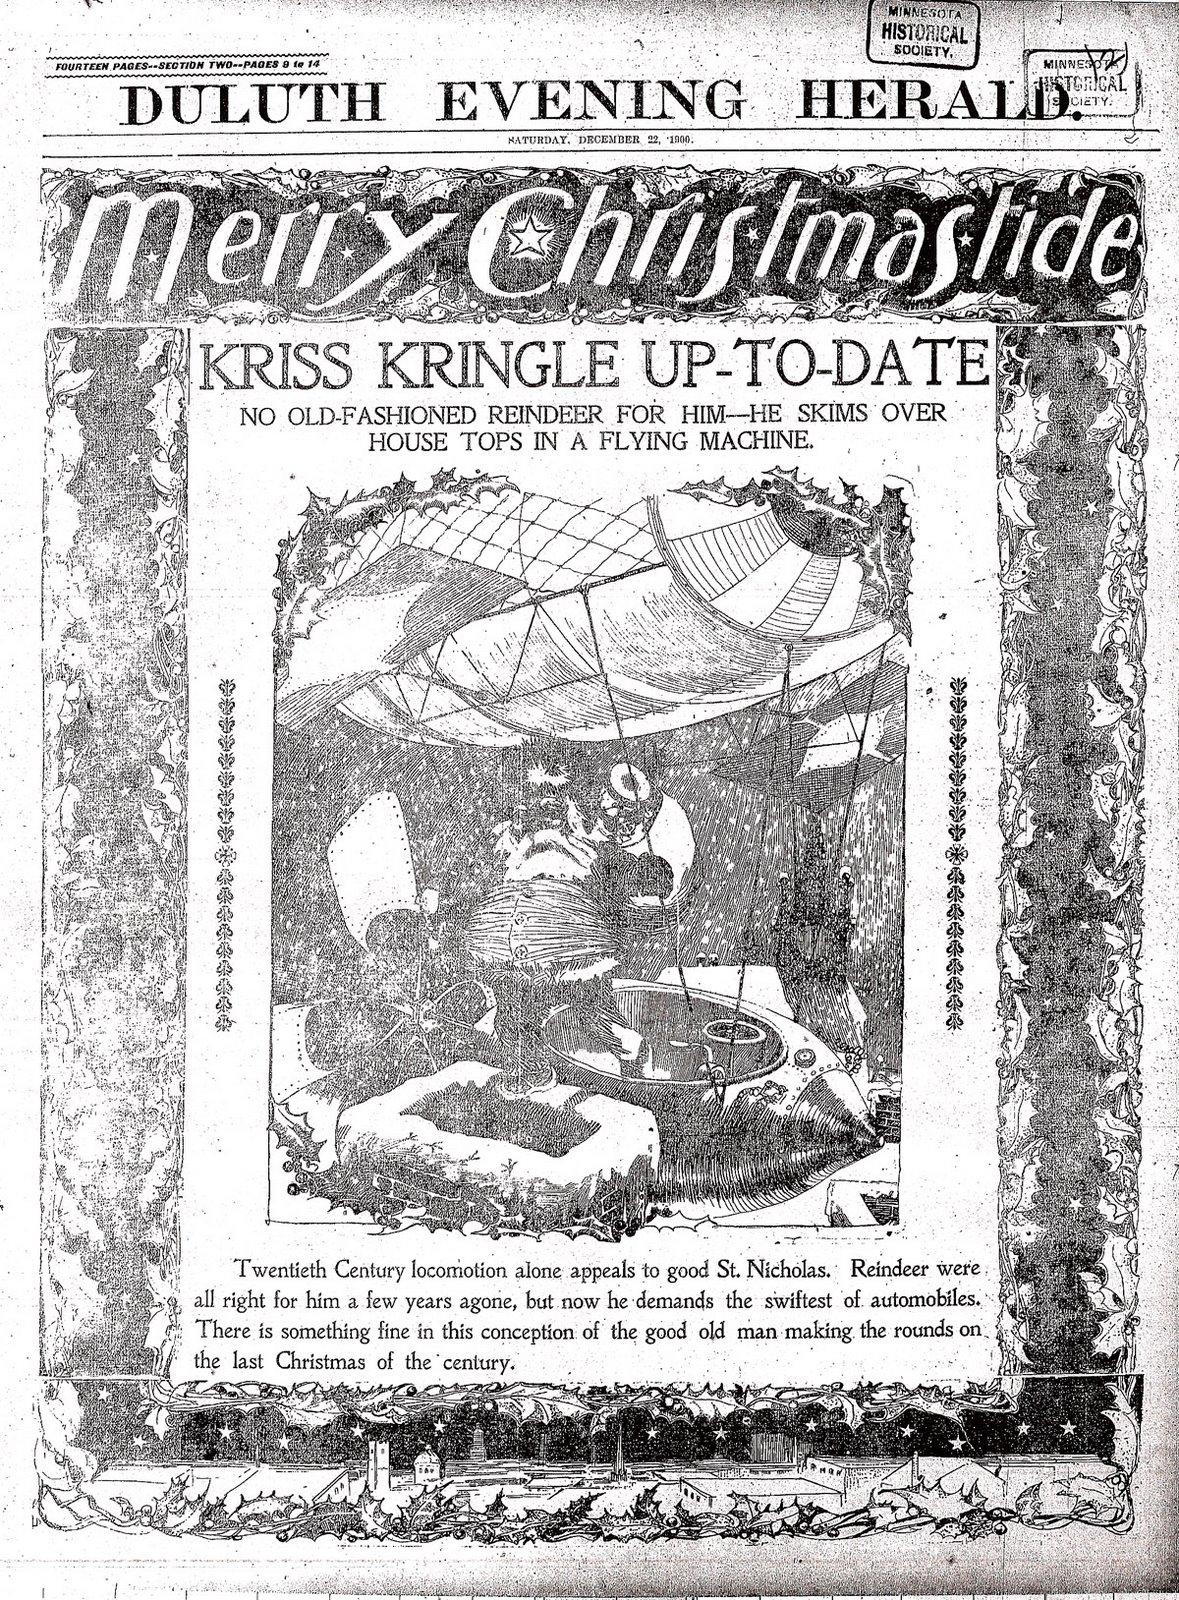 1900 dec 22 santa duluth evening herald paleo-future.jpg